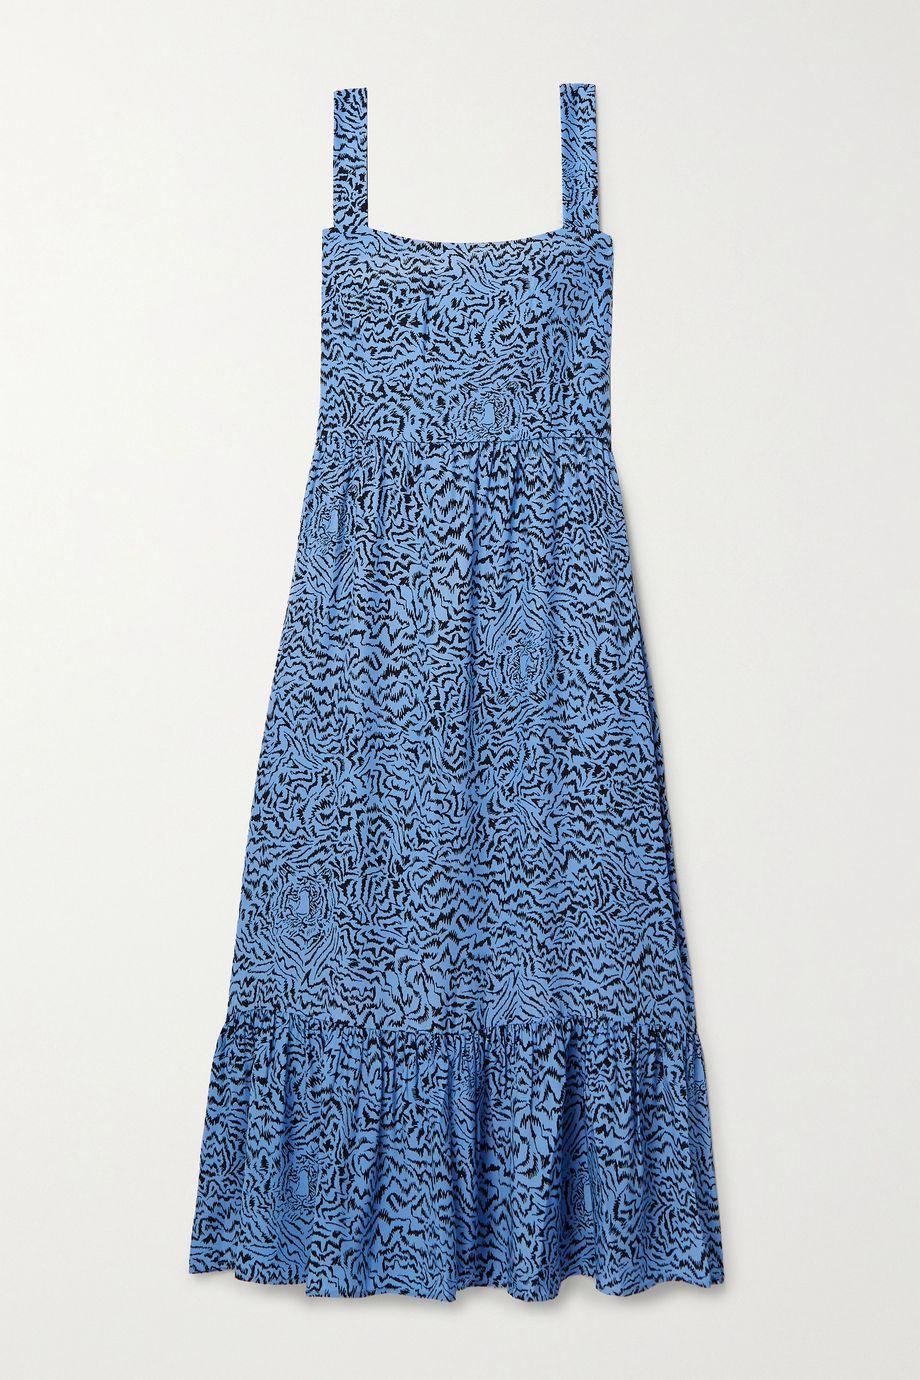 HVN Olympia tiered printed silk midi dress